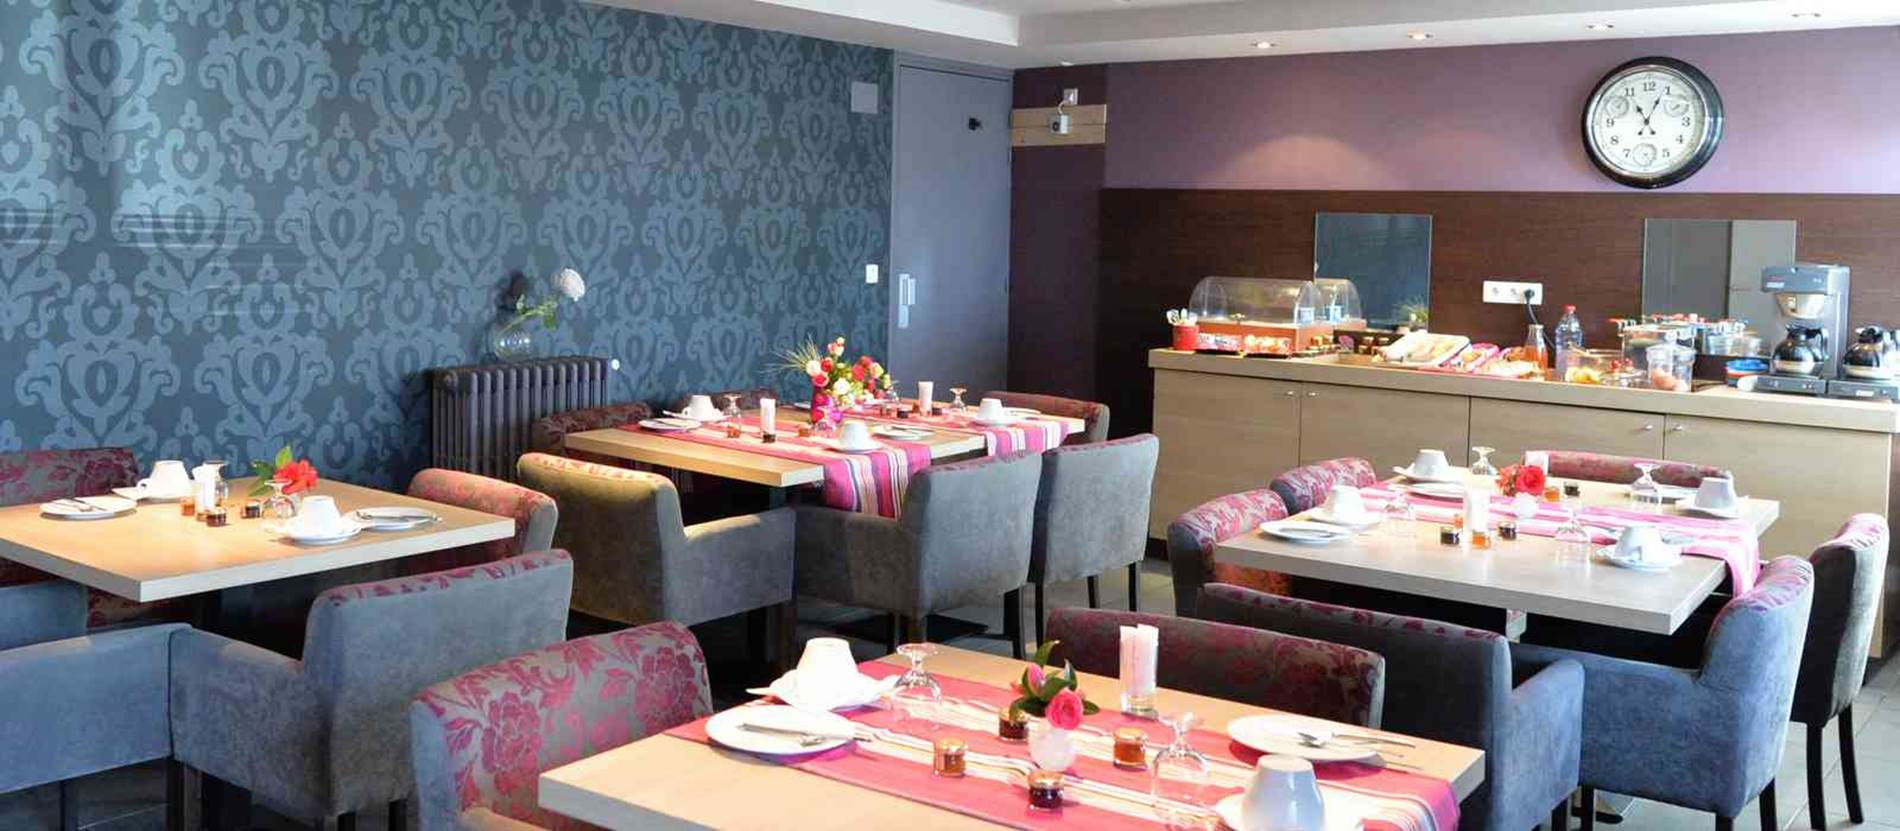 hotel-celtichotel-auray-Morbihan-Bretagne-Sud-buffetdupetitdejeuner © hotel-celtichotel-auray